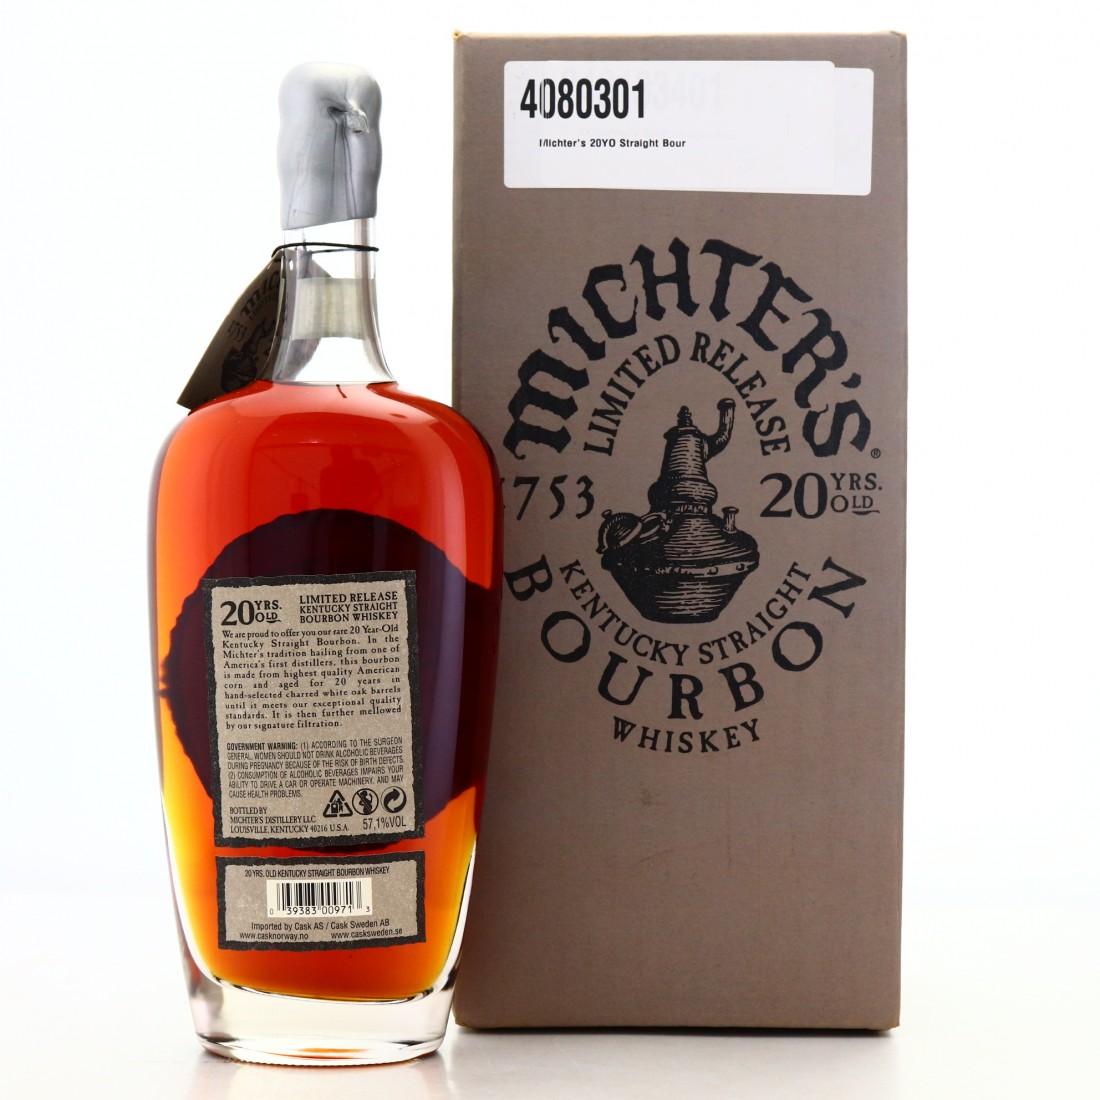 Michter's 20 Year Old Kentucky Straight Bourbon 2018